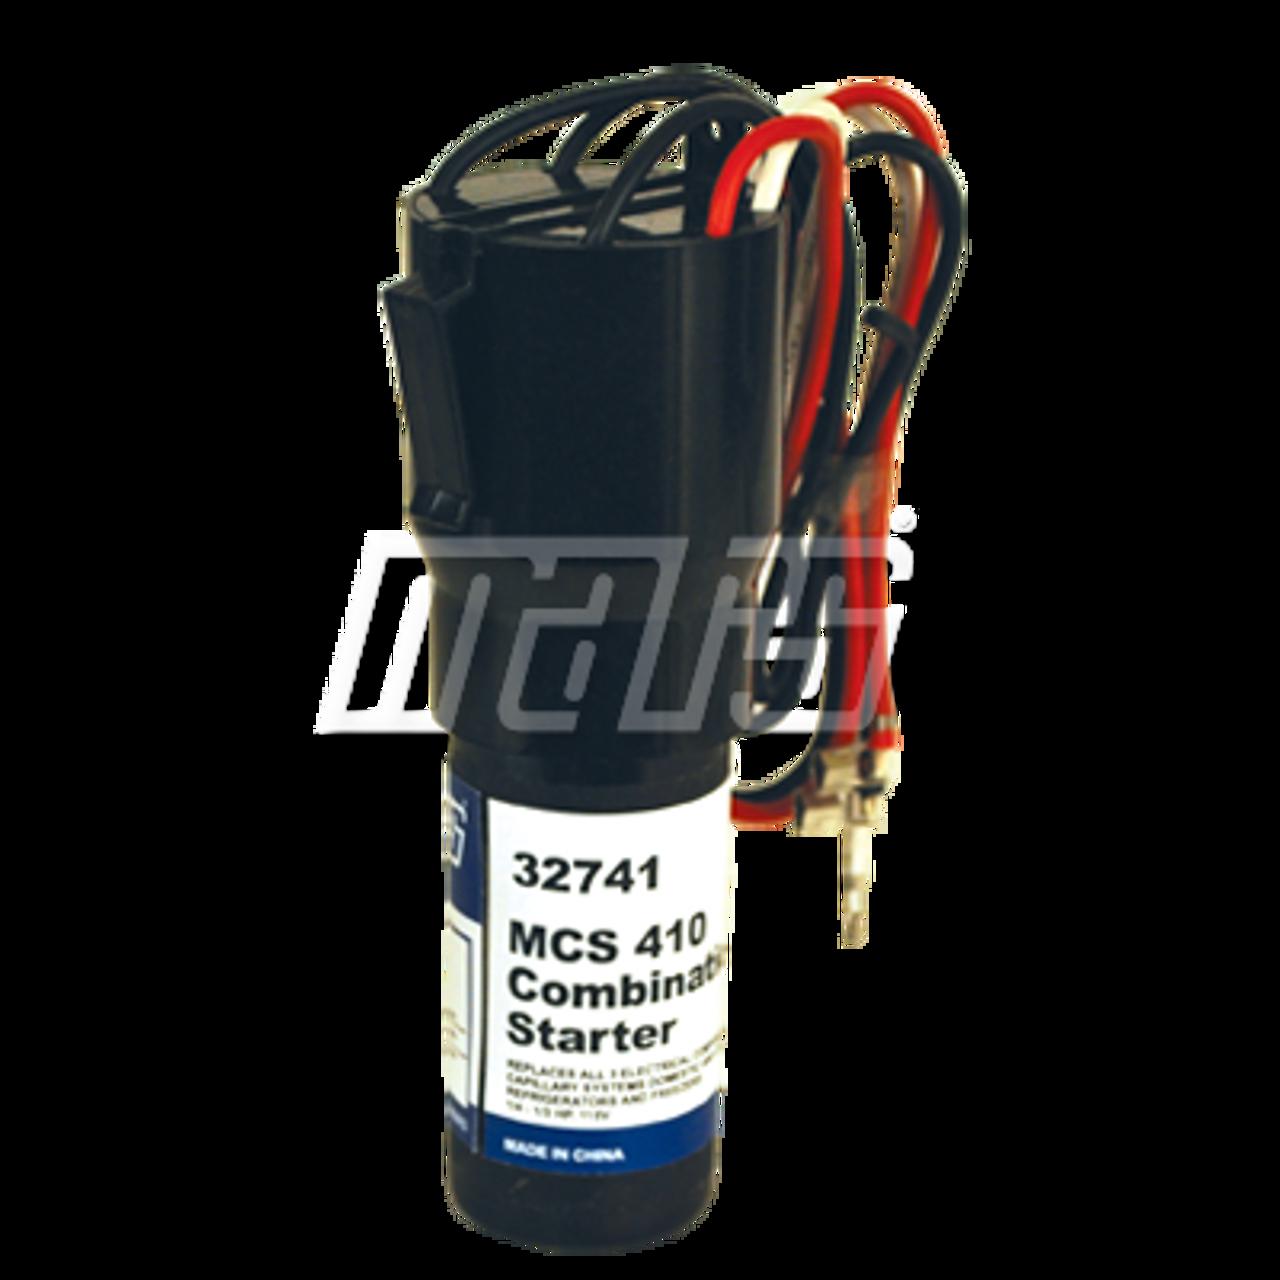 Mars 32741 Combination Starter RELAY/CAP/OV'LD 115V 1/4-1/3HP on compressor start relay diagram, hermetic compressor wiring diagram, compressor start capacitor wiring diagram,